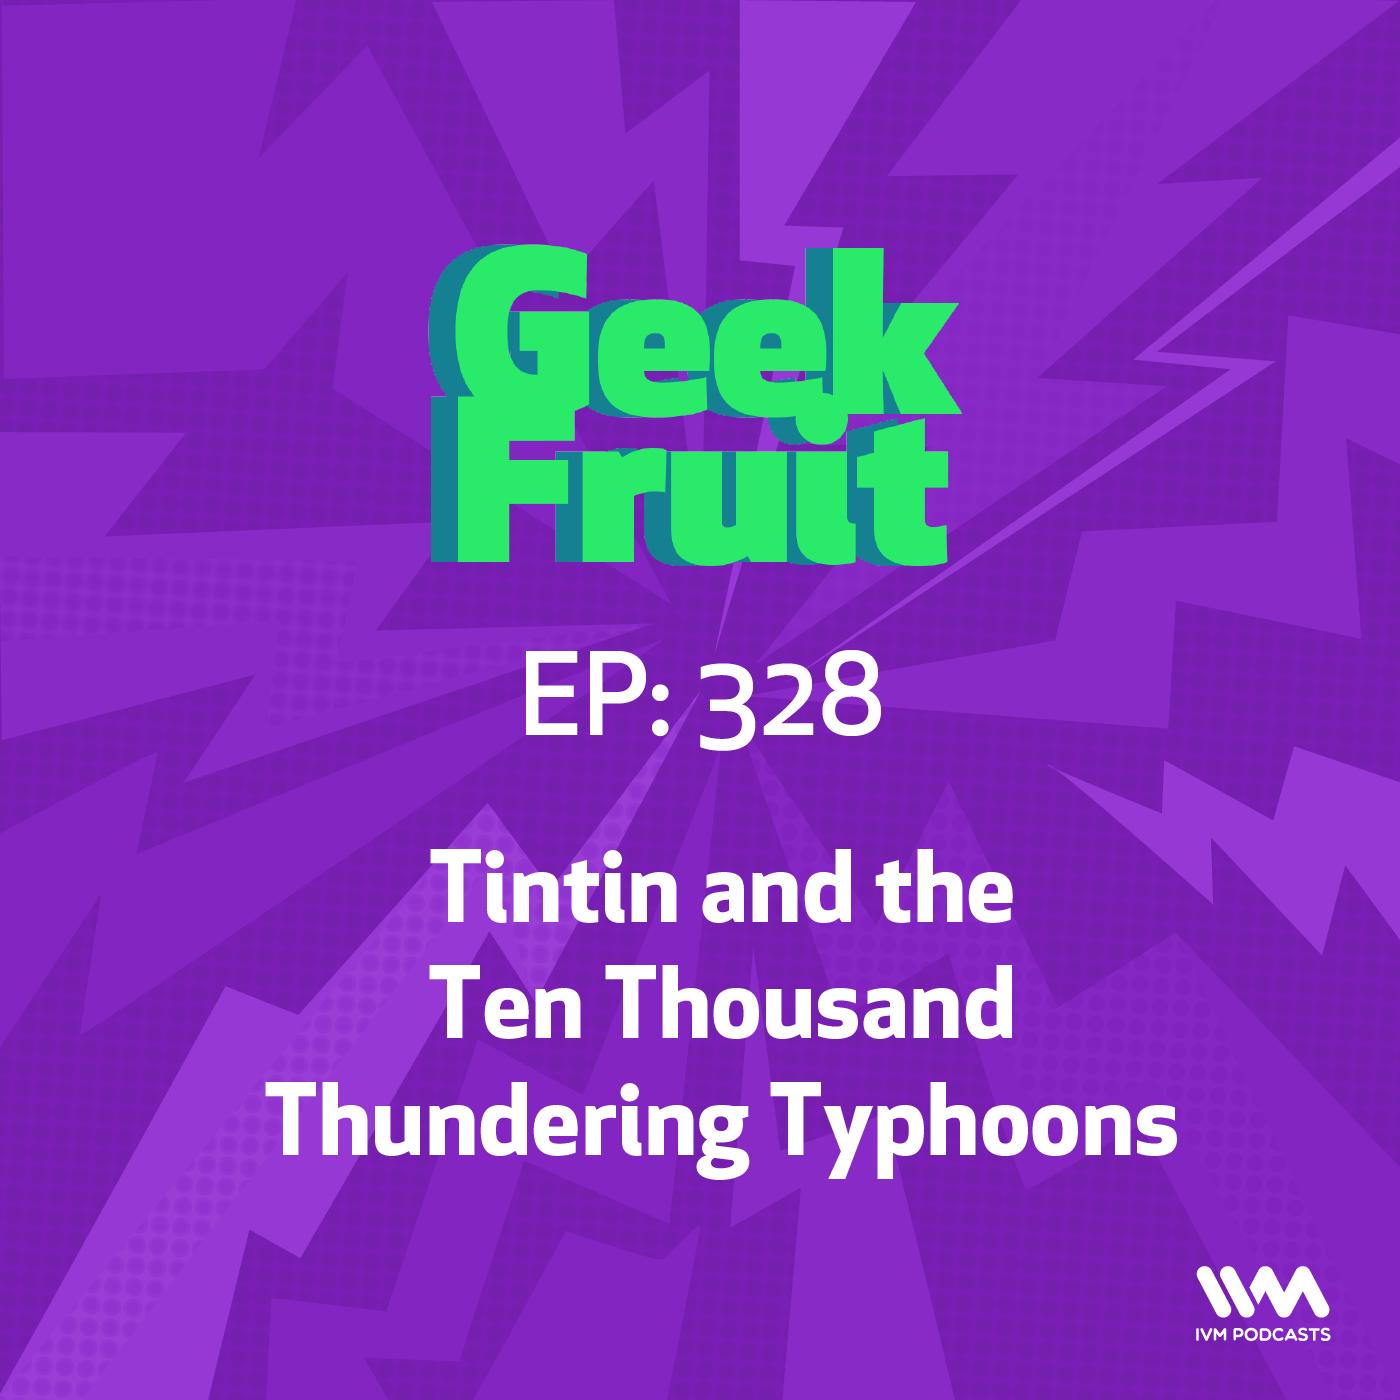 Ep. 328: Tintin and the Ten Thousand Thundering Typhoons